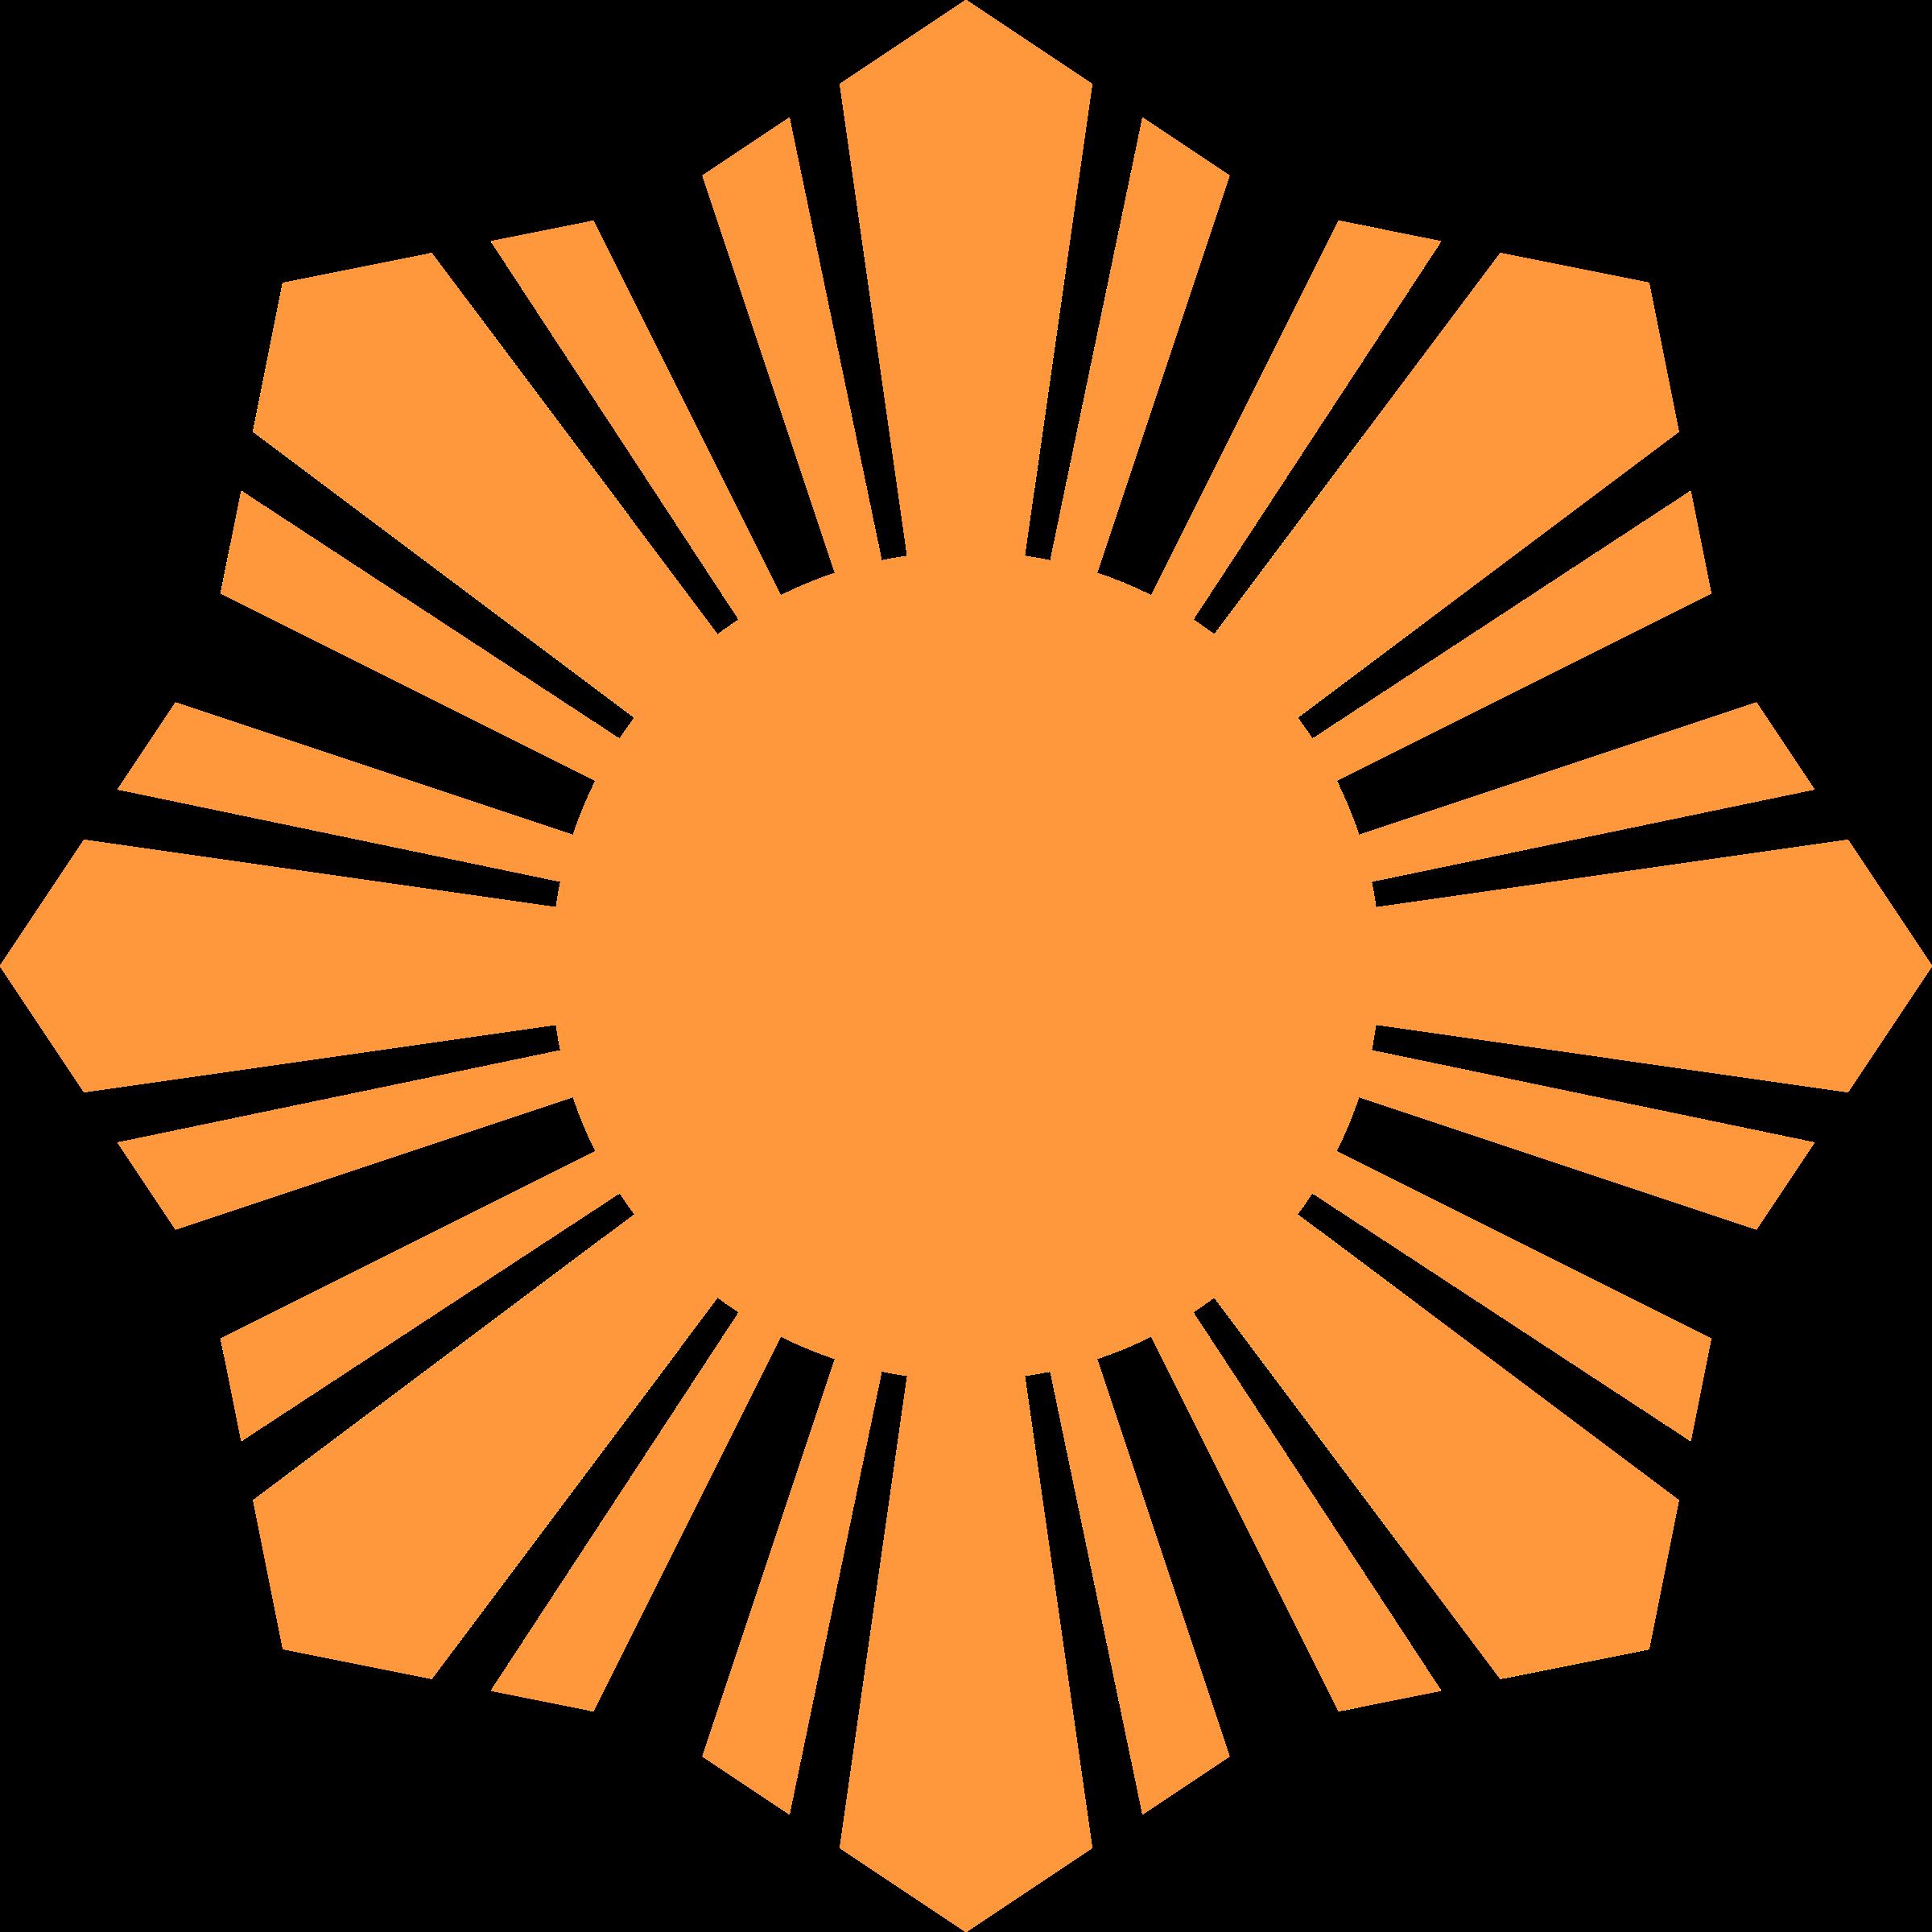 Symbol big image png. Clipart sun orange